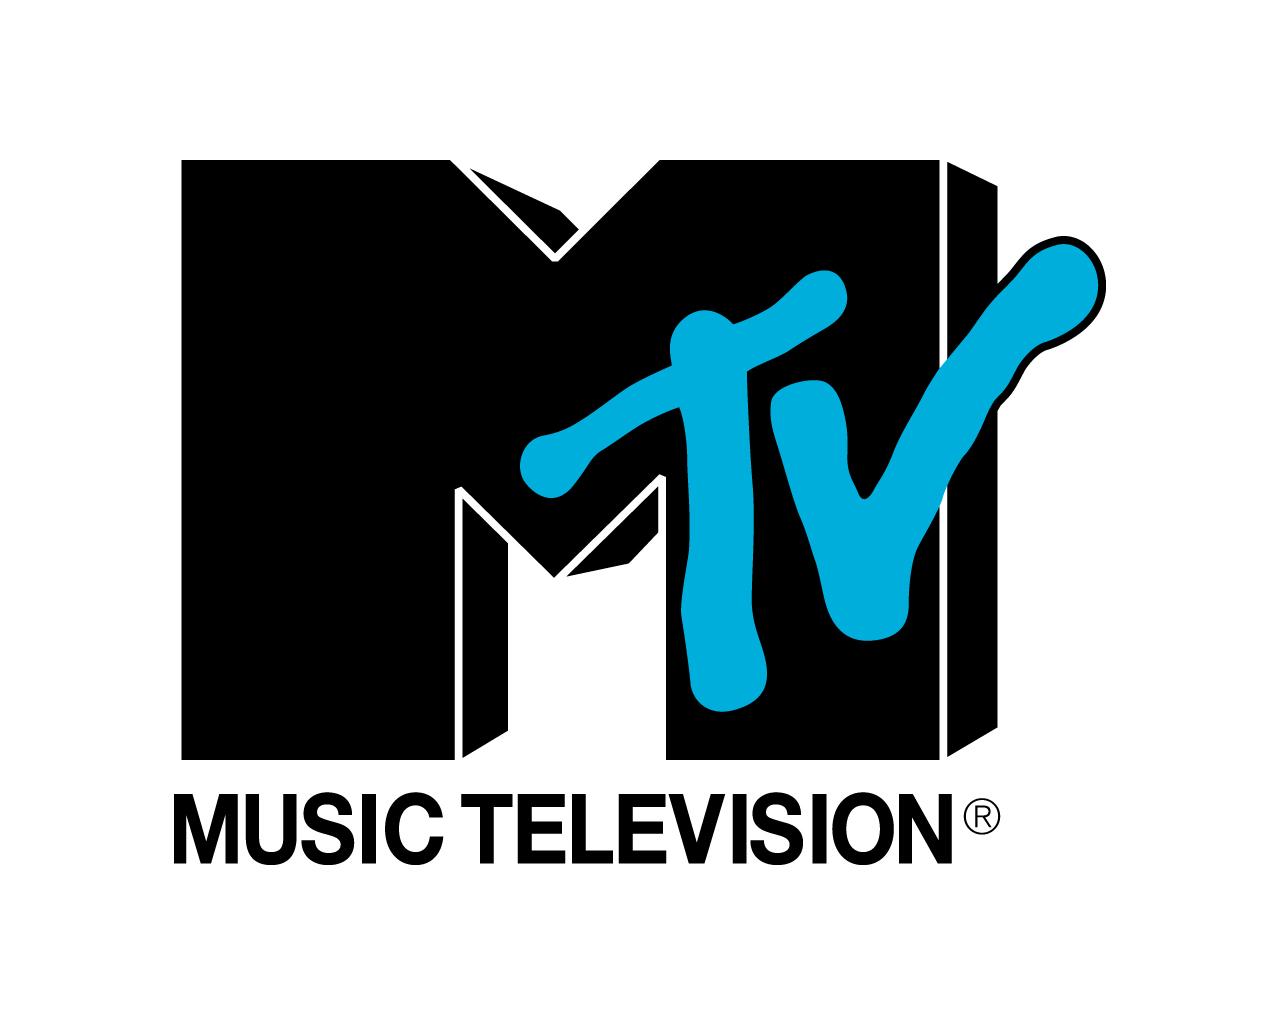 MTV-Logos-HD.jpg